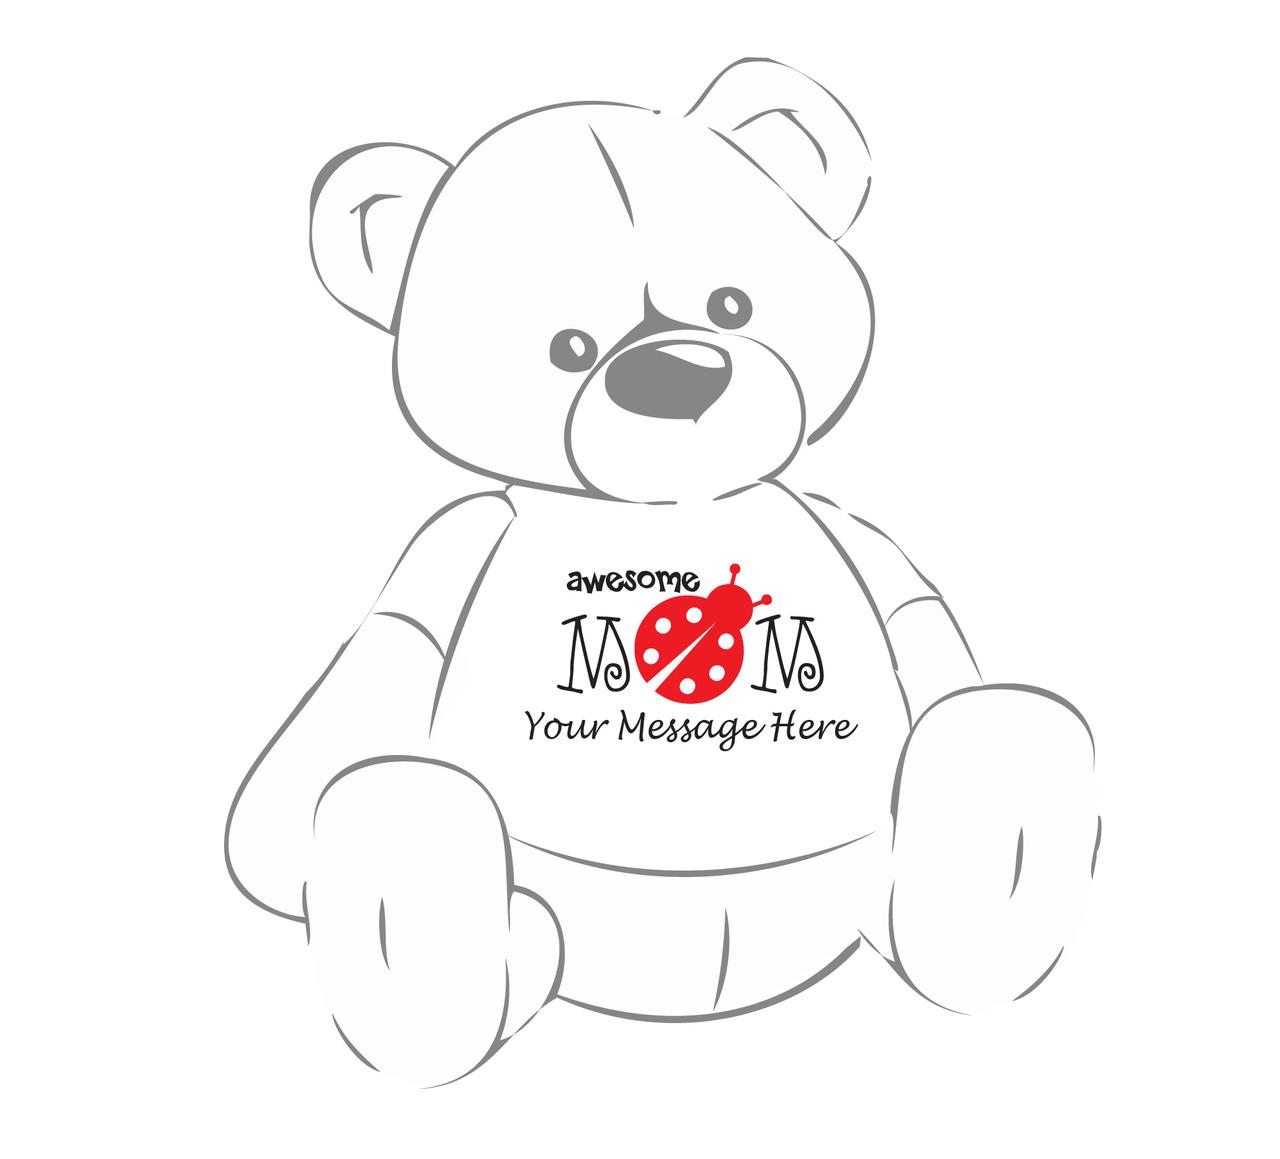 Awesome Mom Lady bug Personalized Giant Teddy Bear shirt